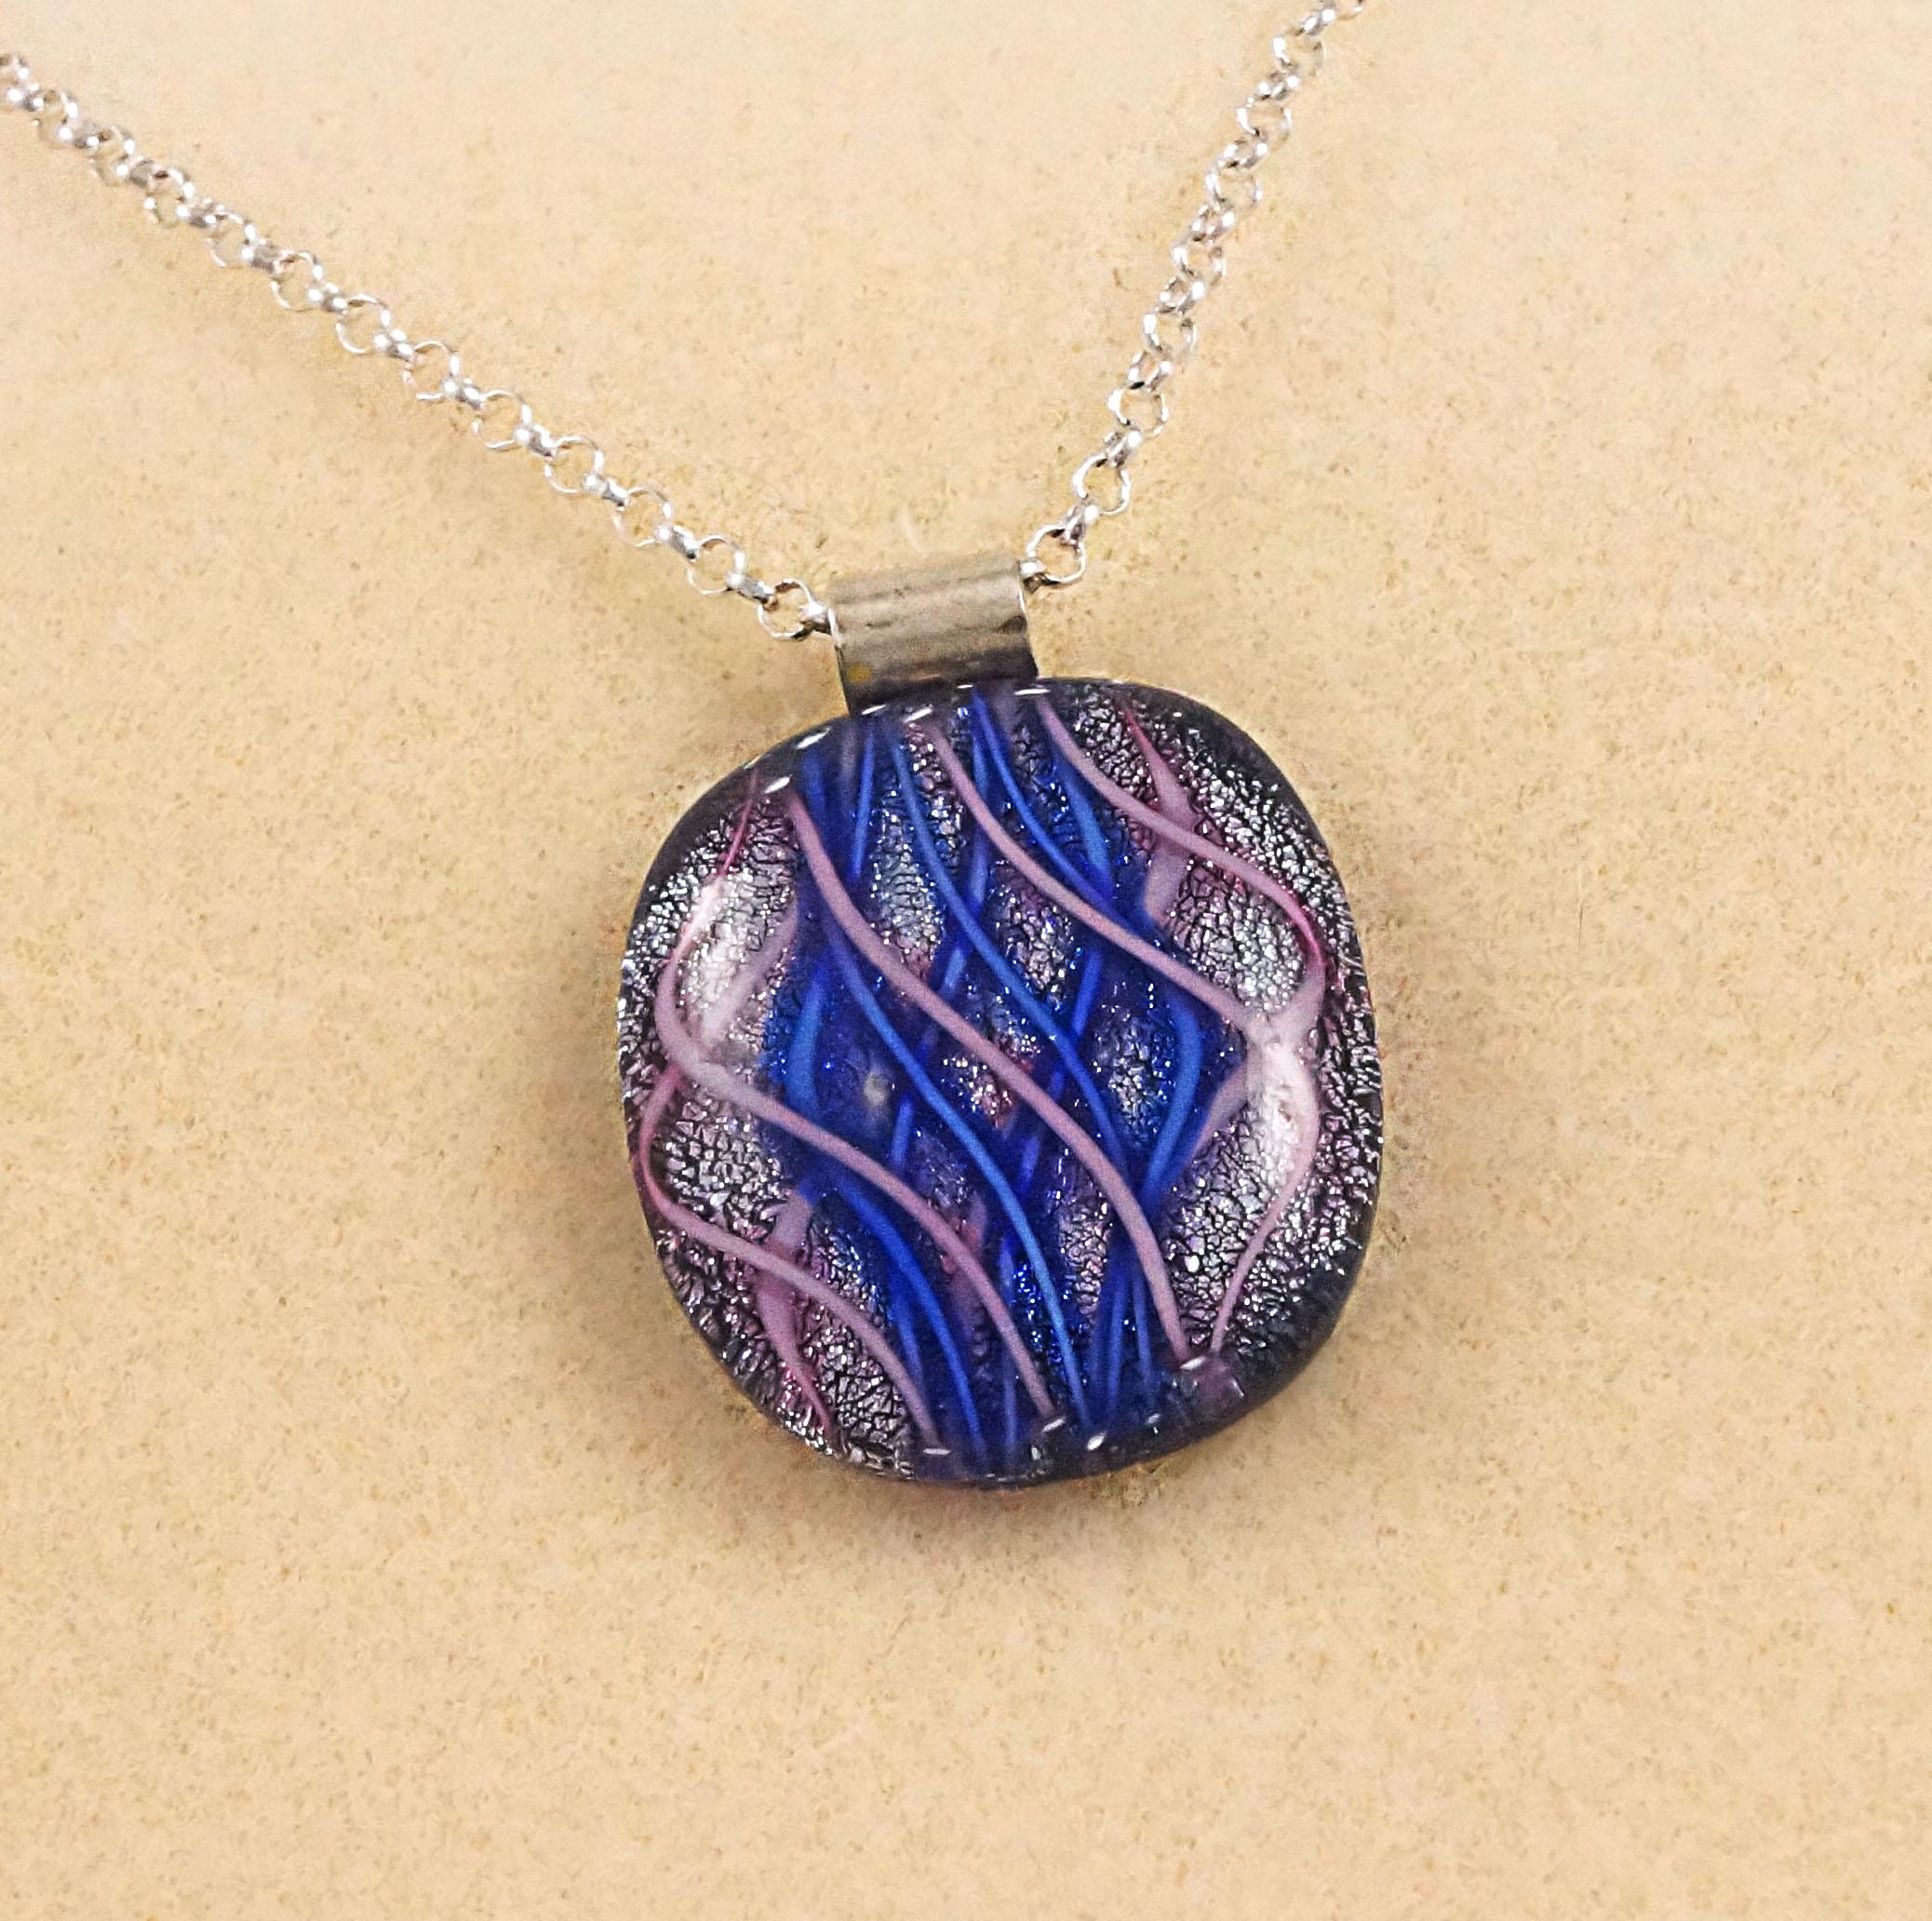 Unique Blue / Pink Dichroic Fused Glass Pendant